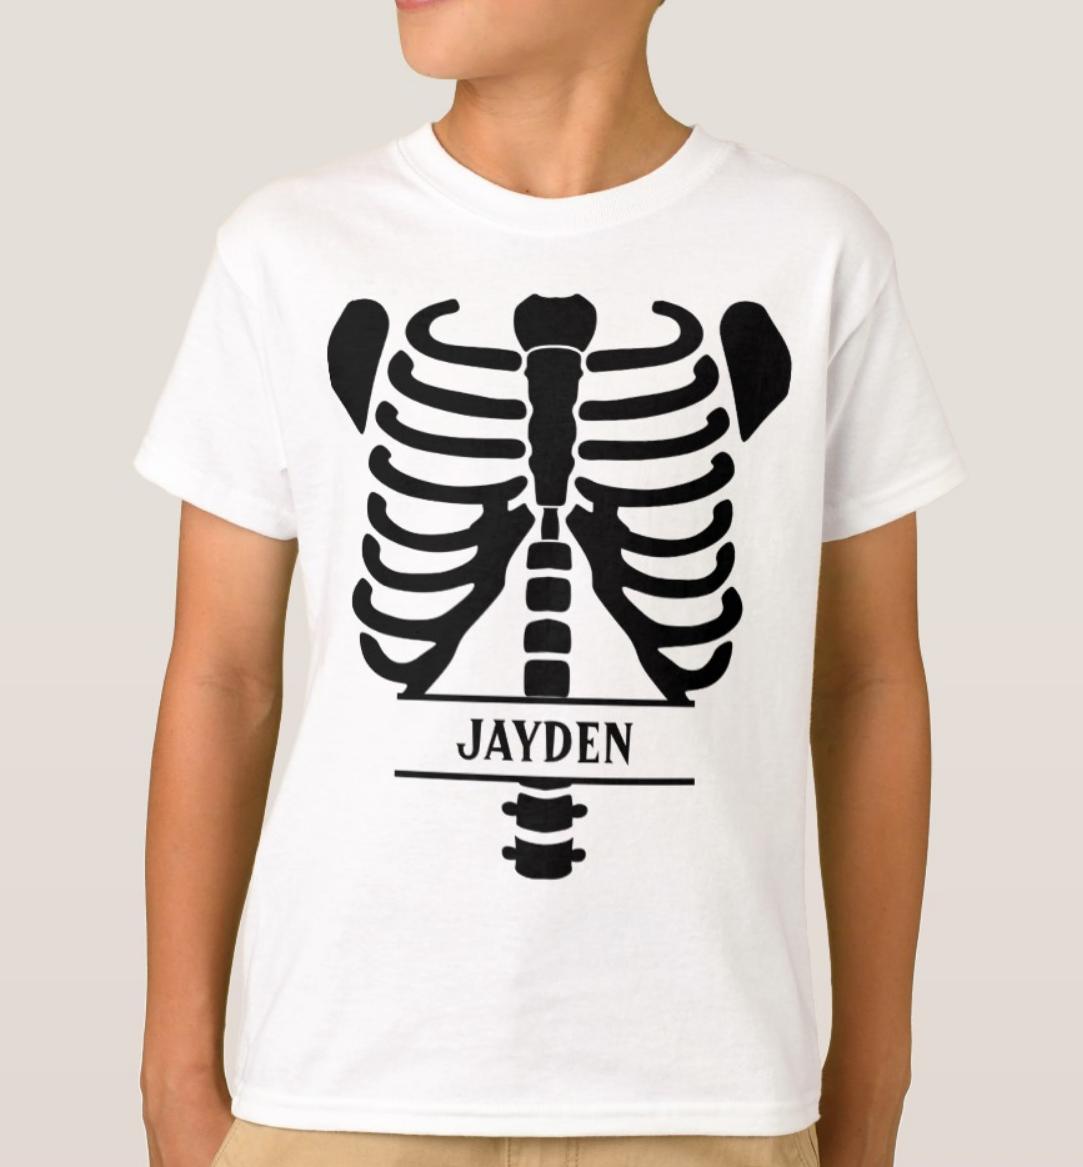 Skeleton Ribs Monogrammed T-Shirt | Zazzle.com | Monogram ...